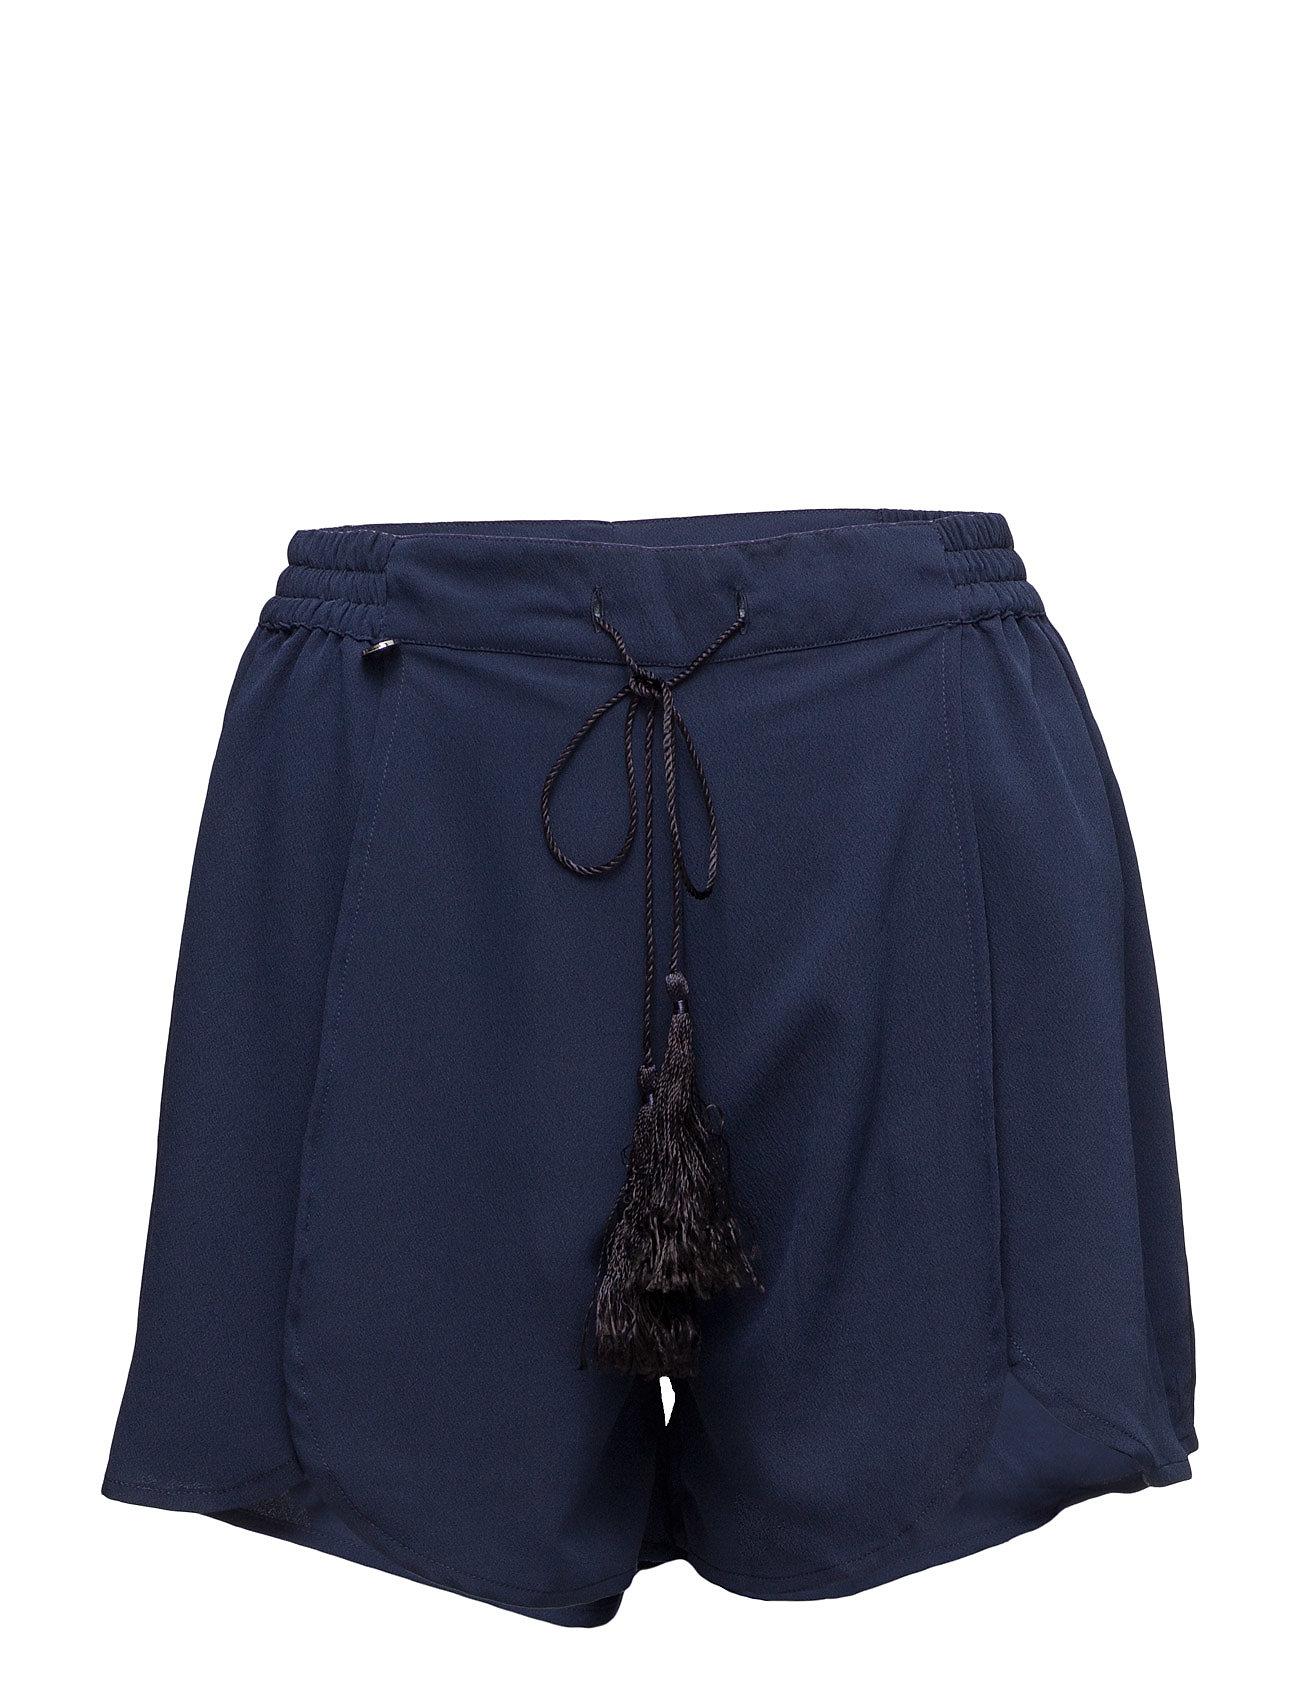 Rae Panos Emporio Strandtøj til Damer i Navy blå